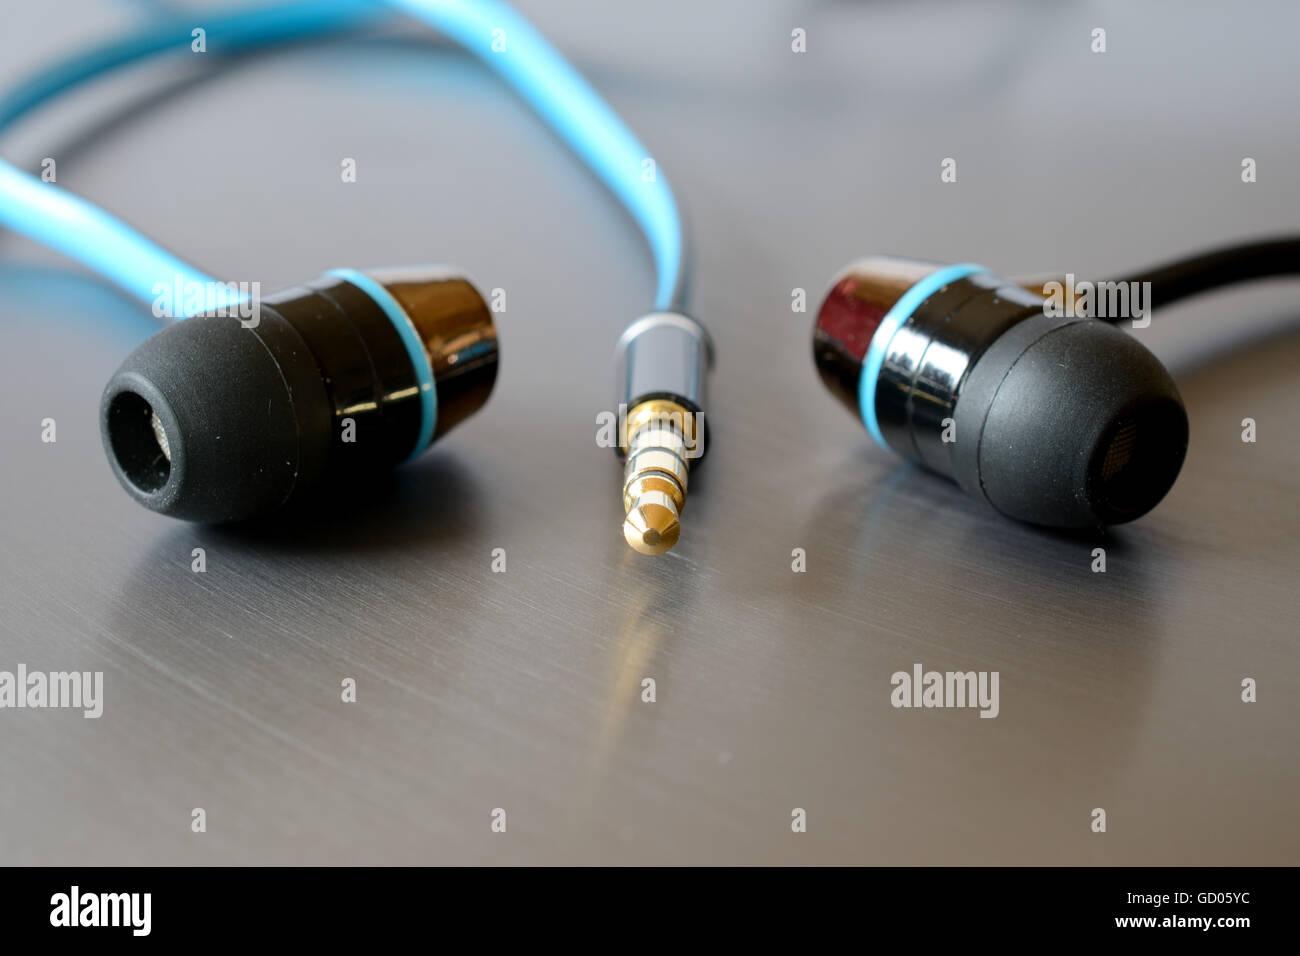 Earphones and jack plug closeup. Shallow depth of field. Stock Photo